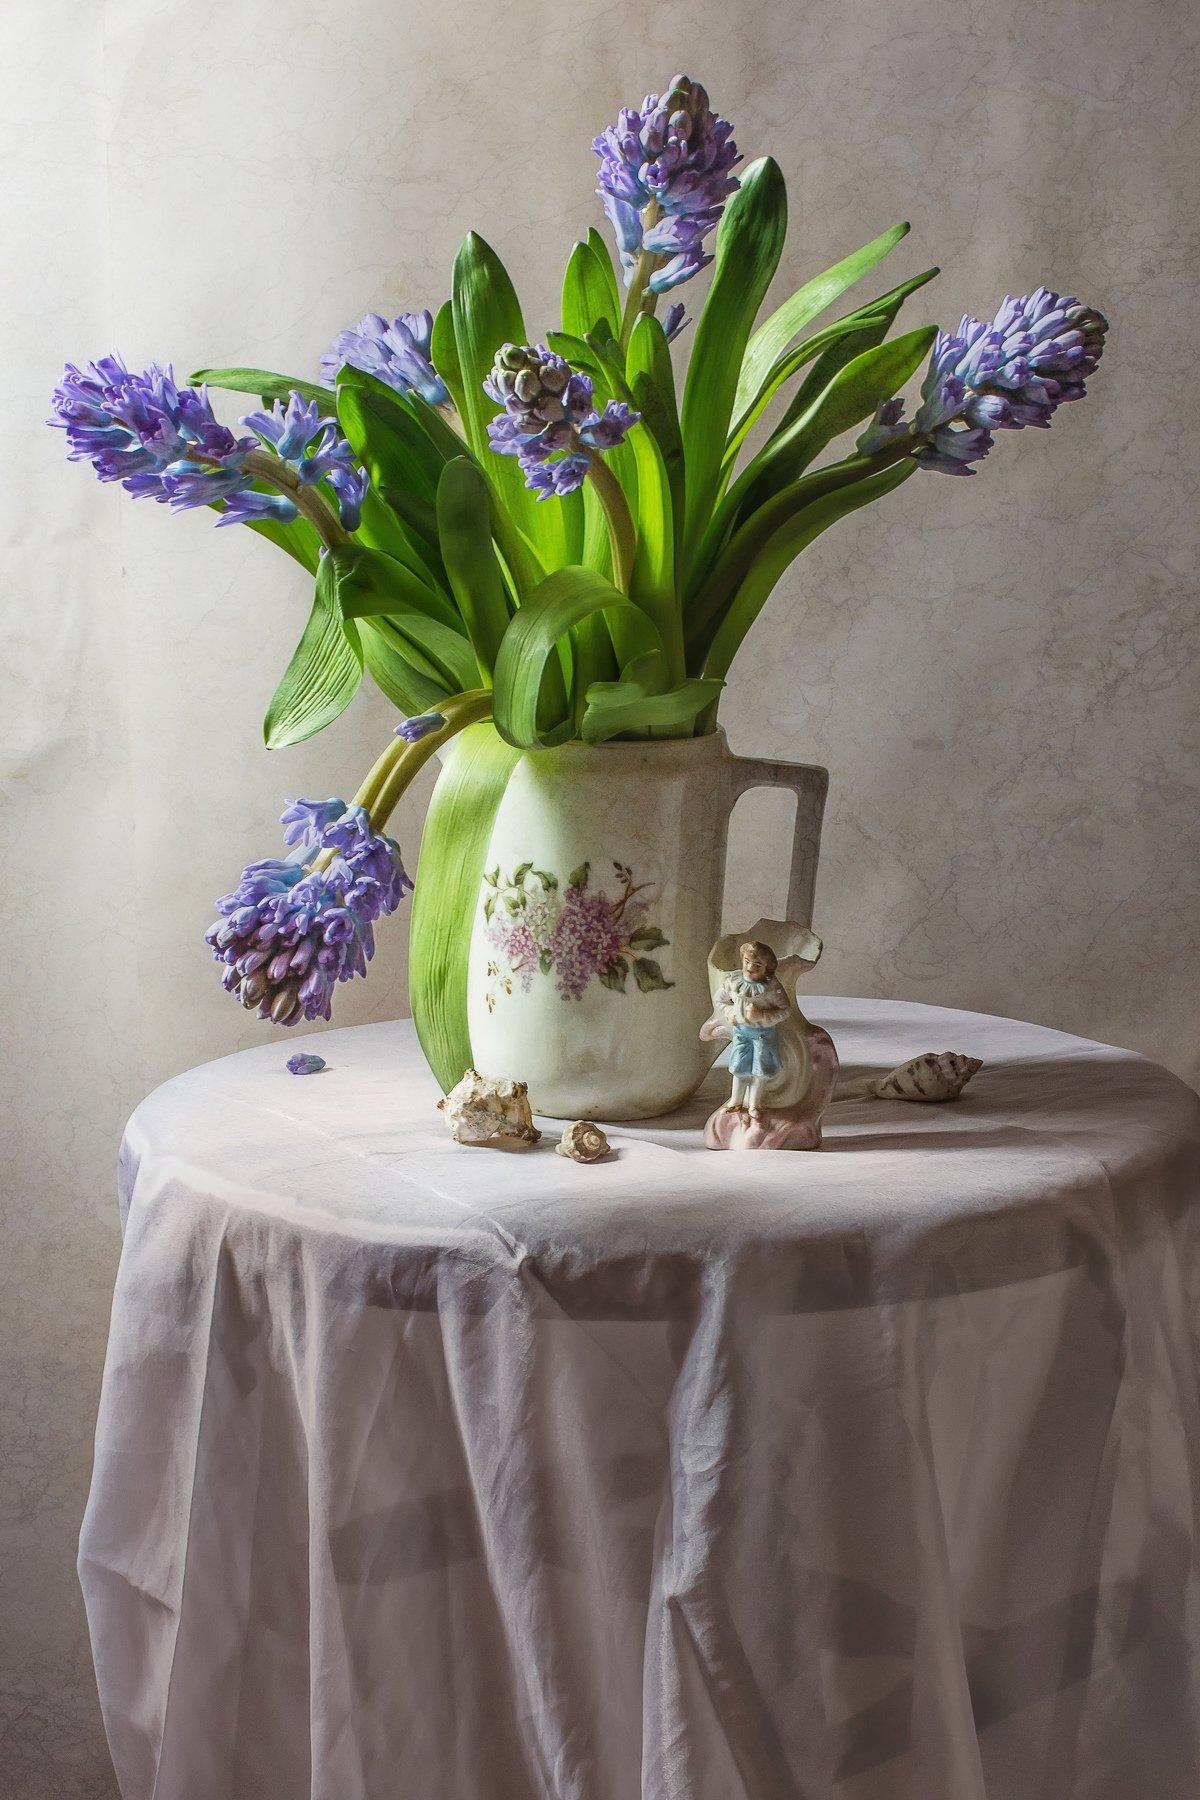 натюрморт, фарфор, кувшин, цветы, гиацинты, Анна Петина